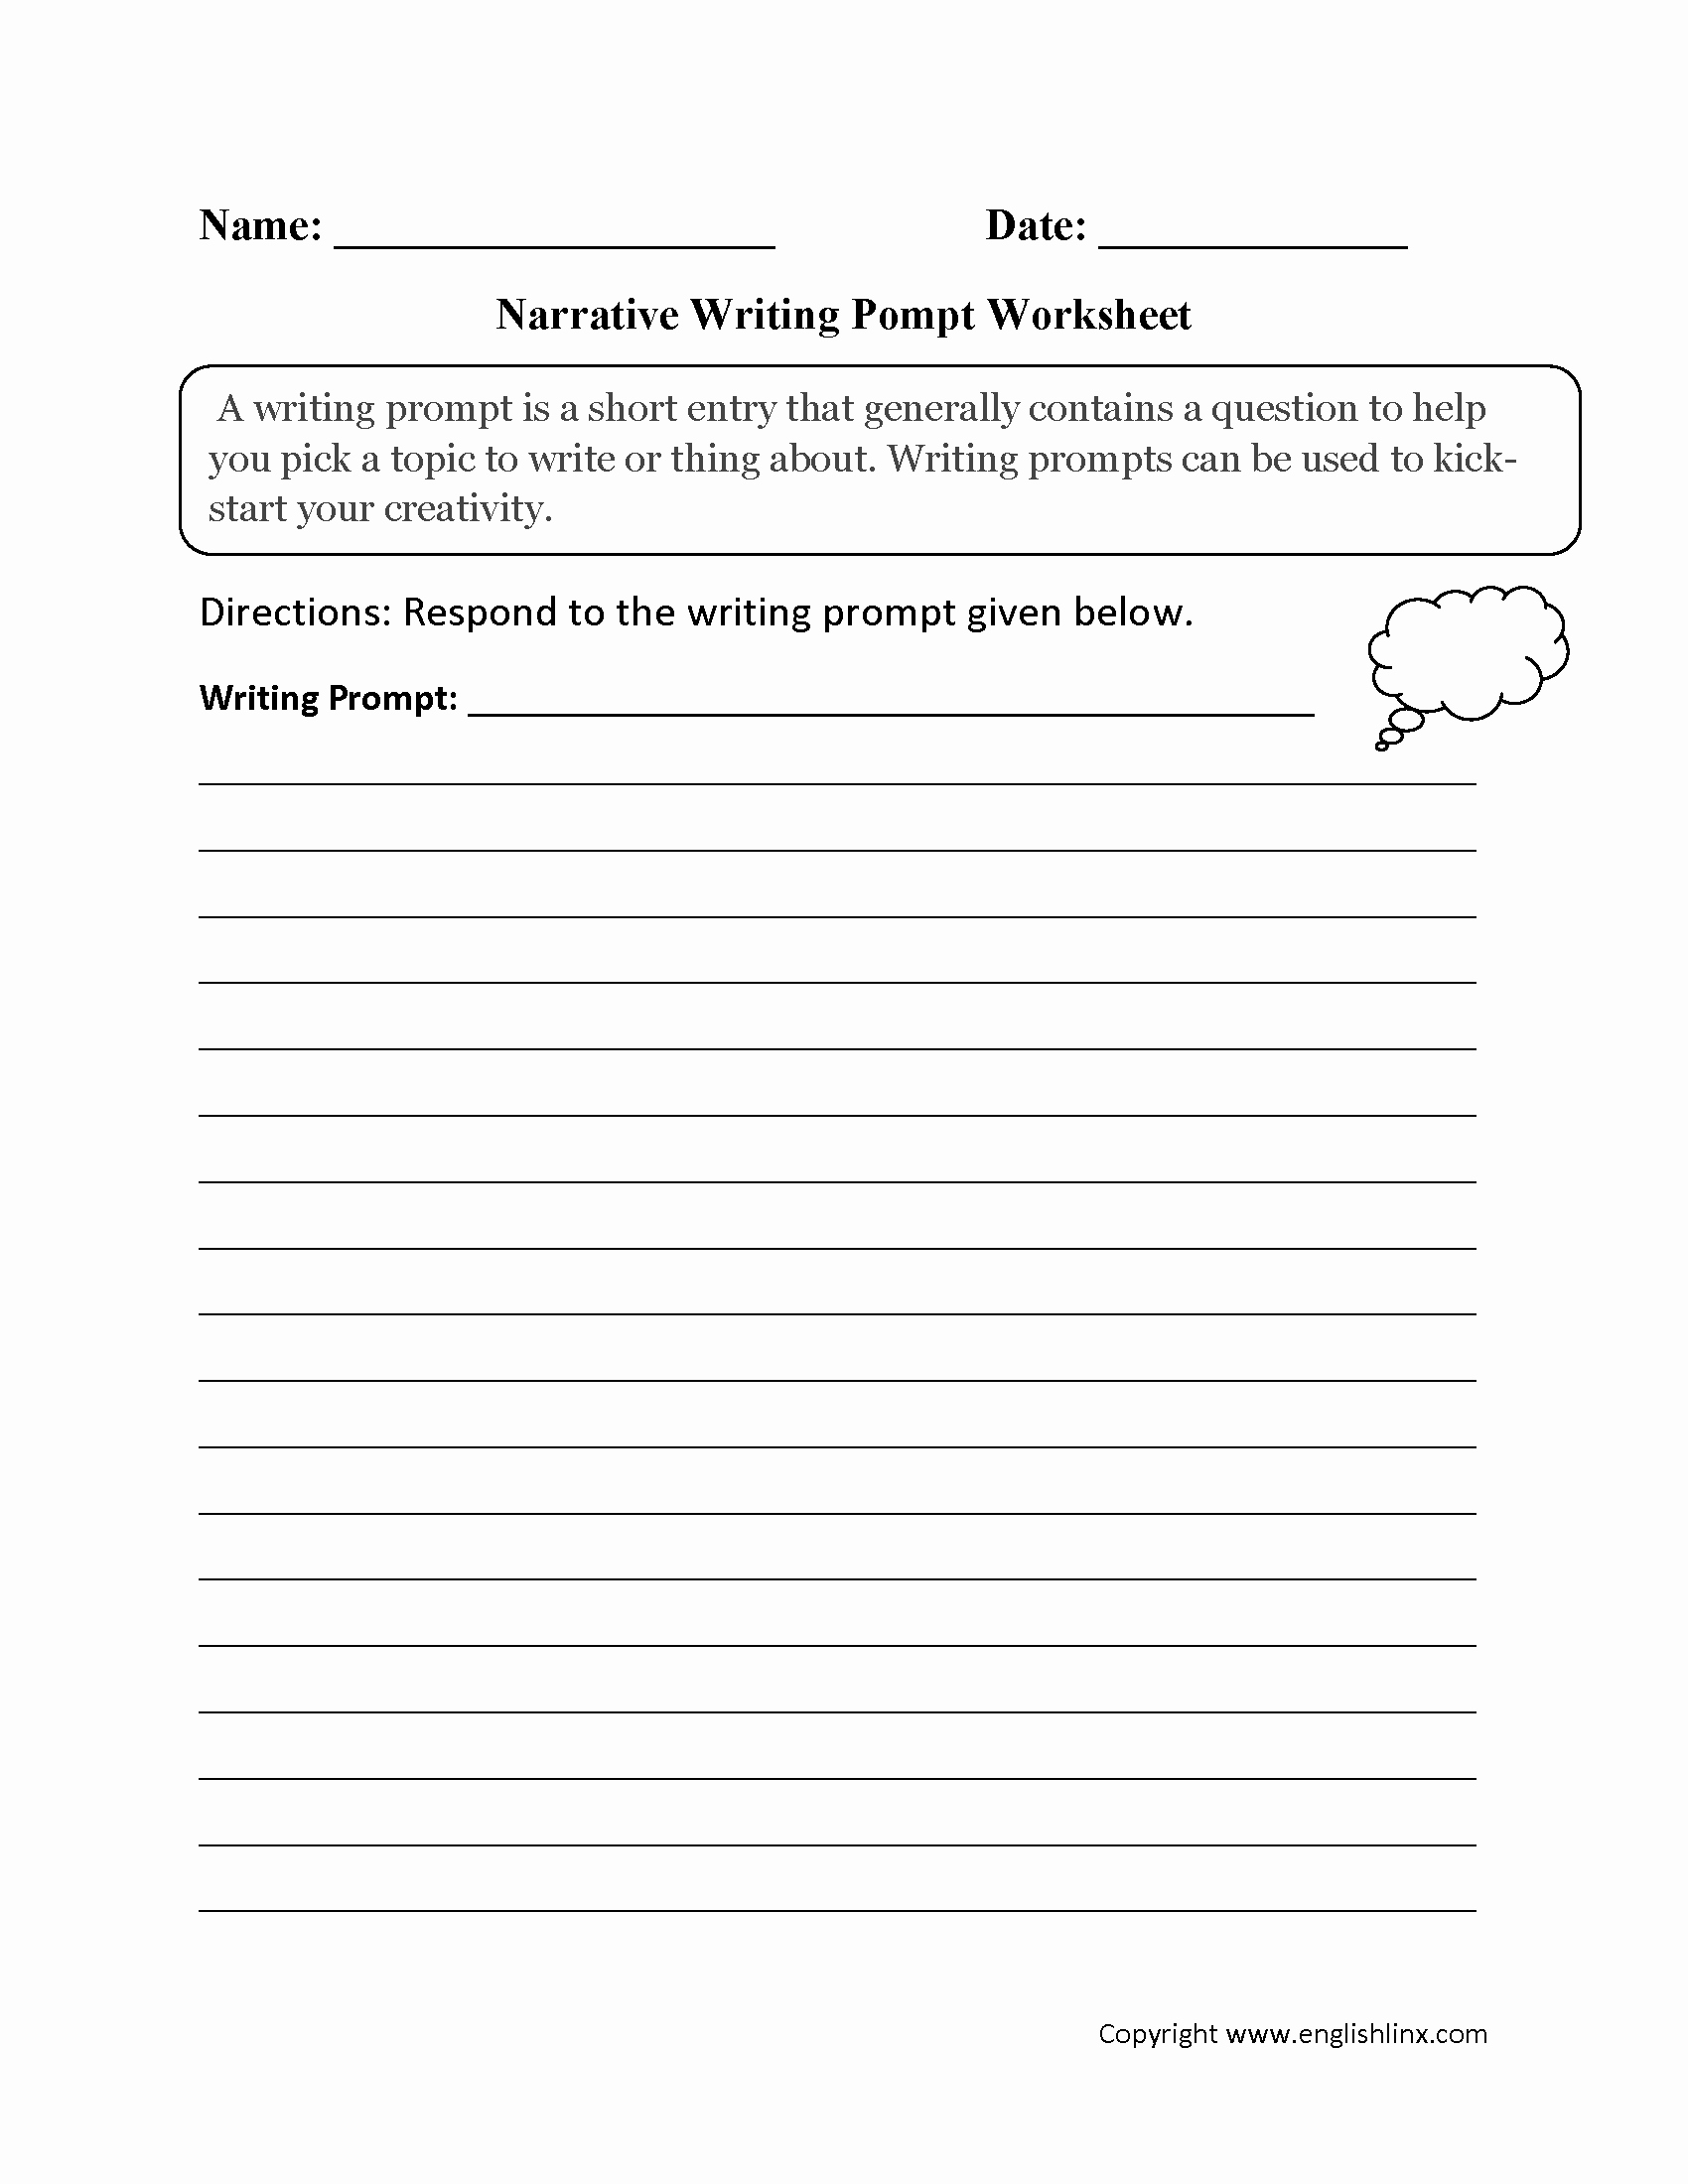 6th Grade Essay Writing Worksheets Beautiful Creative Writing Activities for 6th Grade 6th Grade